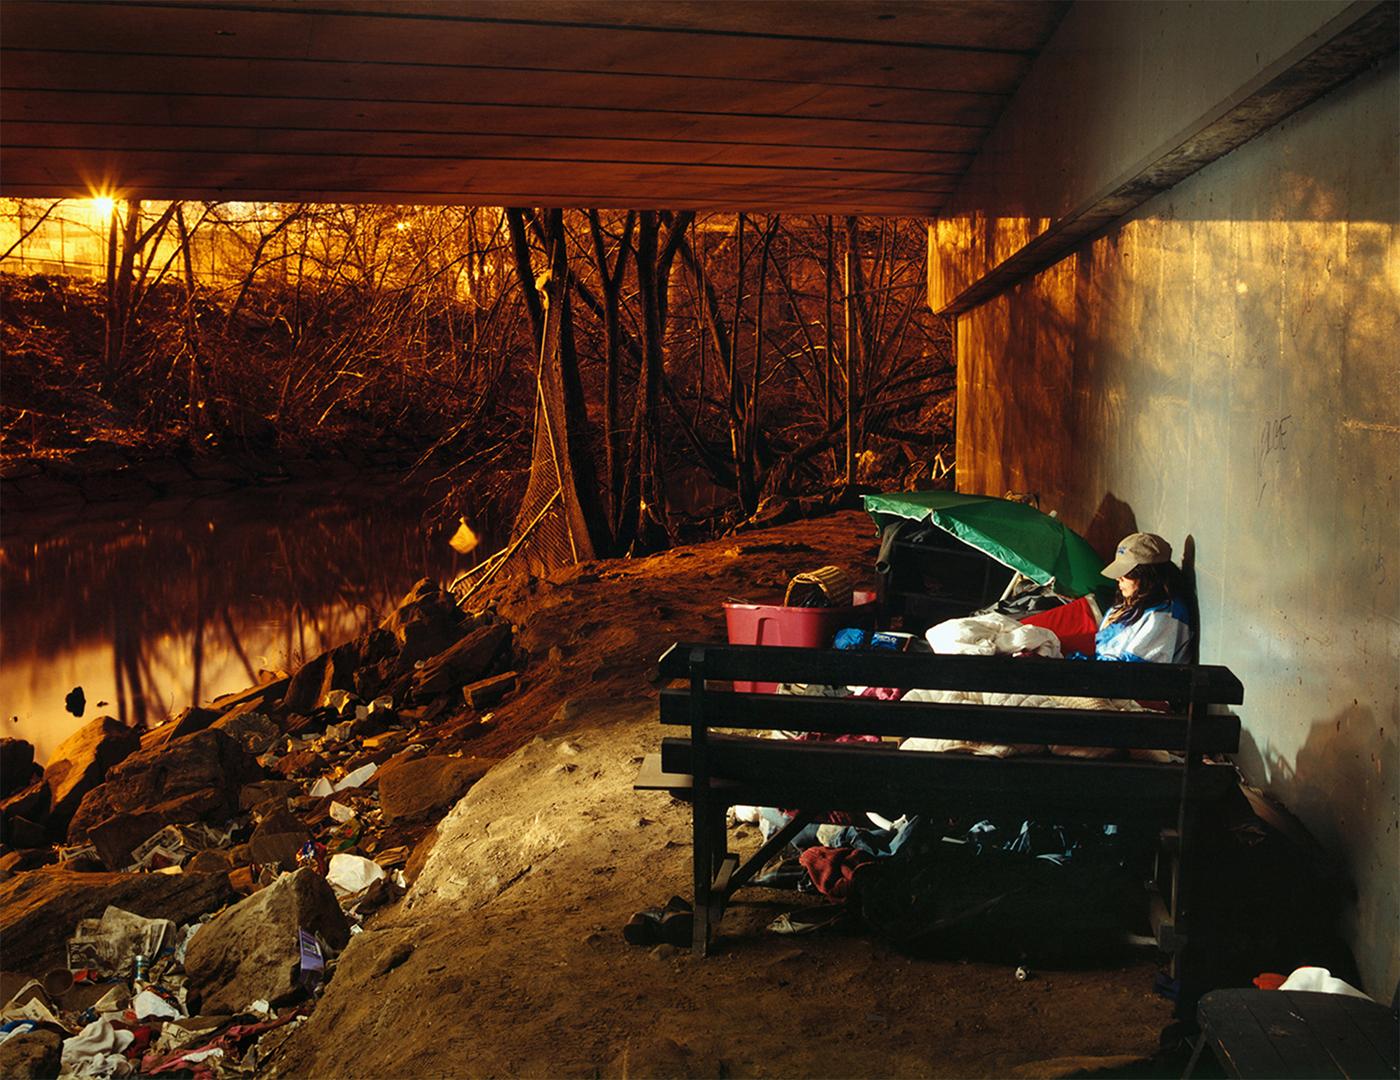 Nancy - homeless woman - Bronx, NY